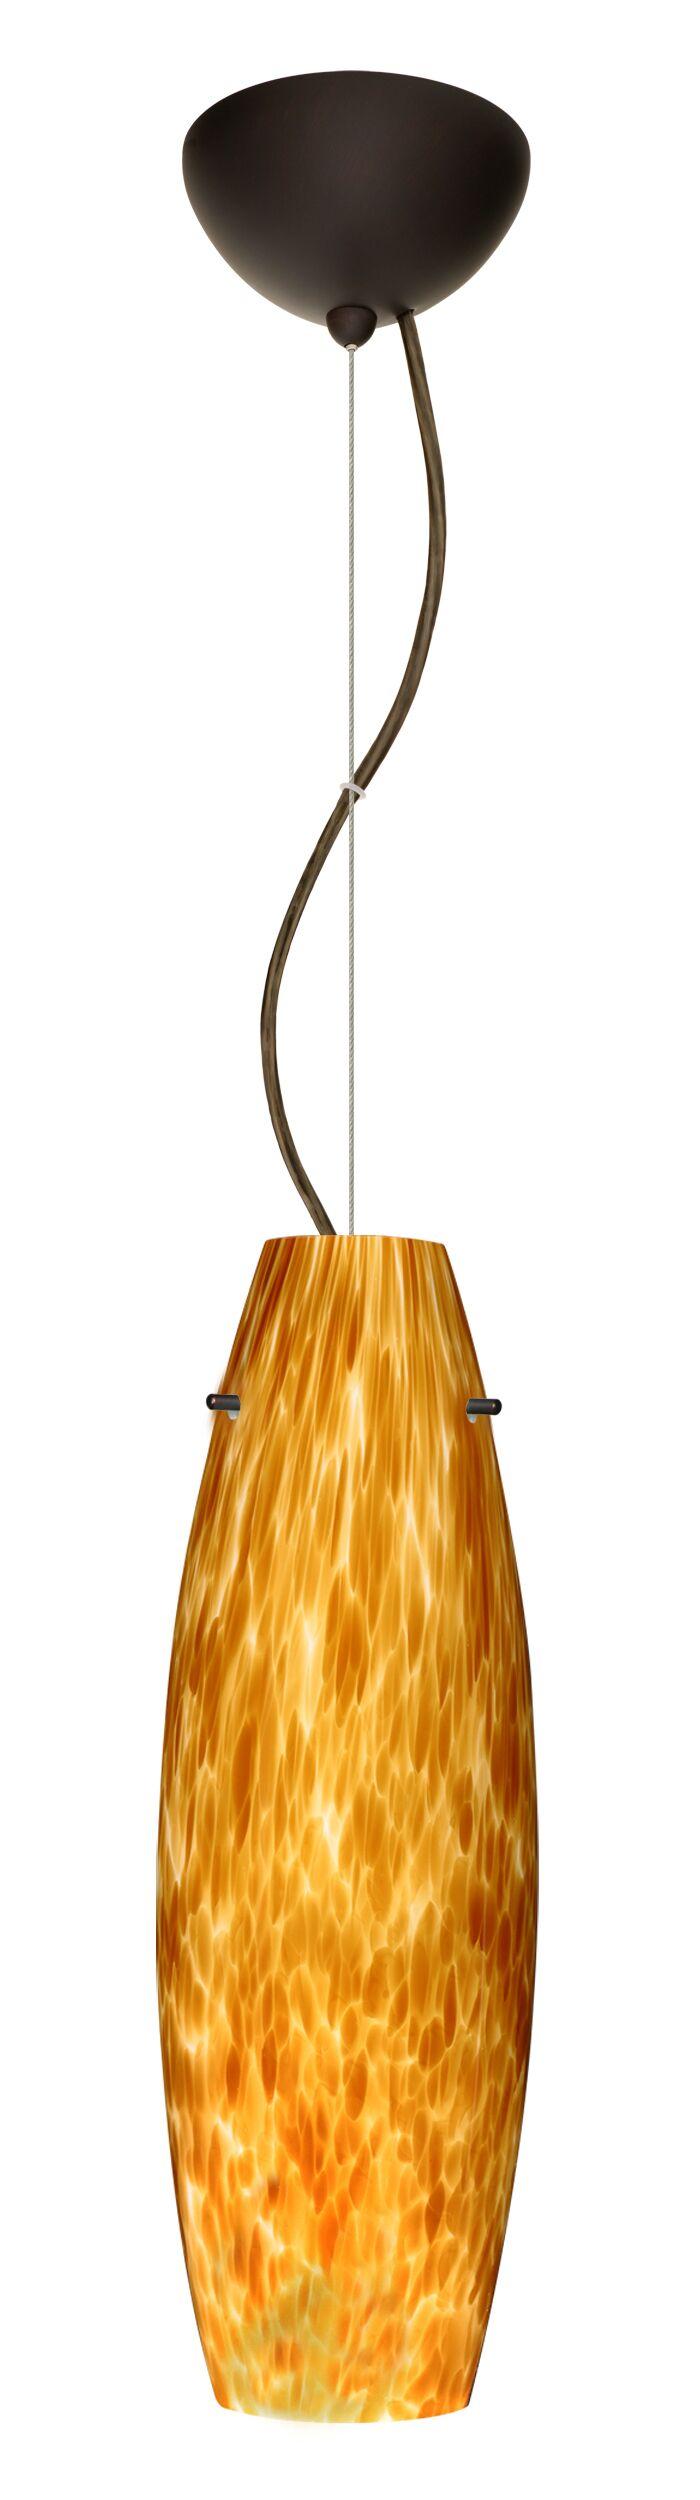 Tara 1-Light Cylinder Pendant Finish: Bronze, Glass Shade: Amber Cloud, Bulb Type: LED